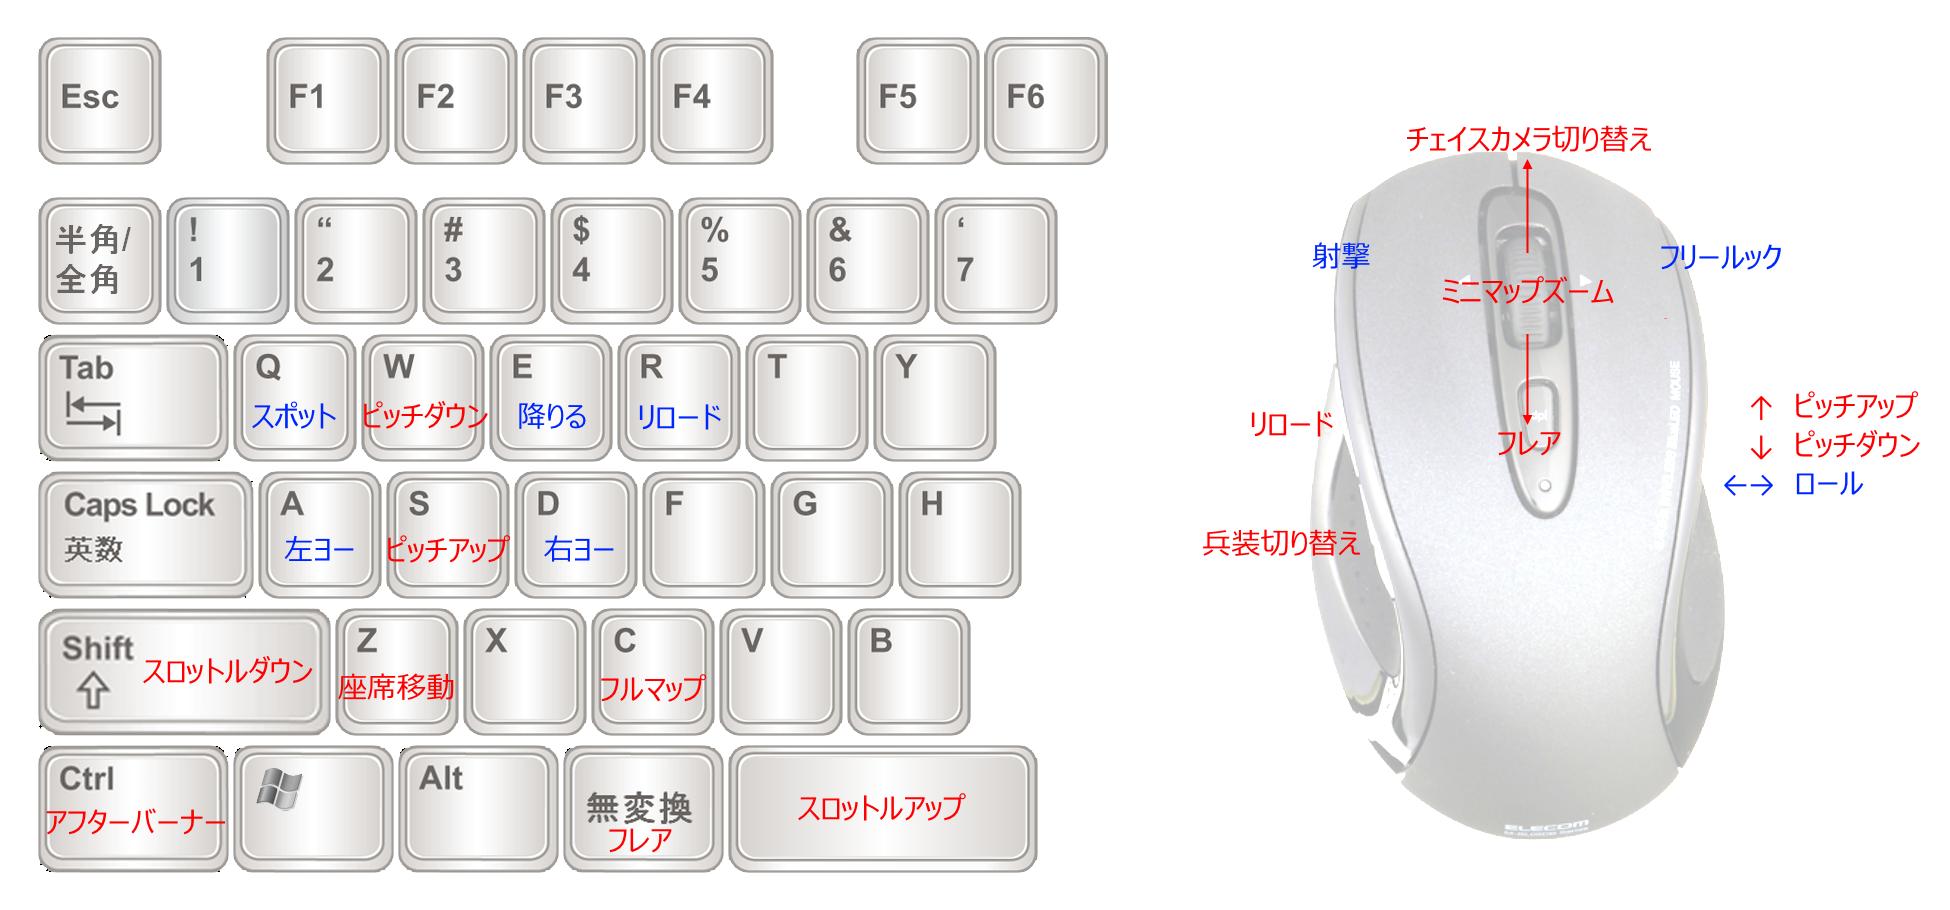 PC版BF4 キーバインドの一例 : わ ... : パソコン キーボード 説明 : すべての講義